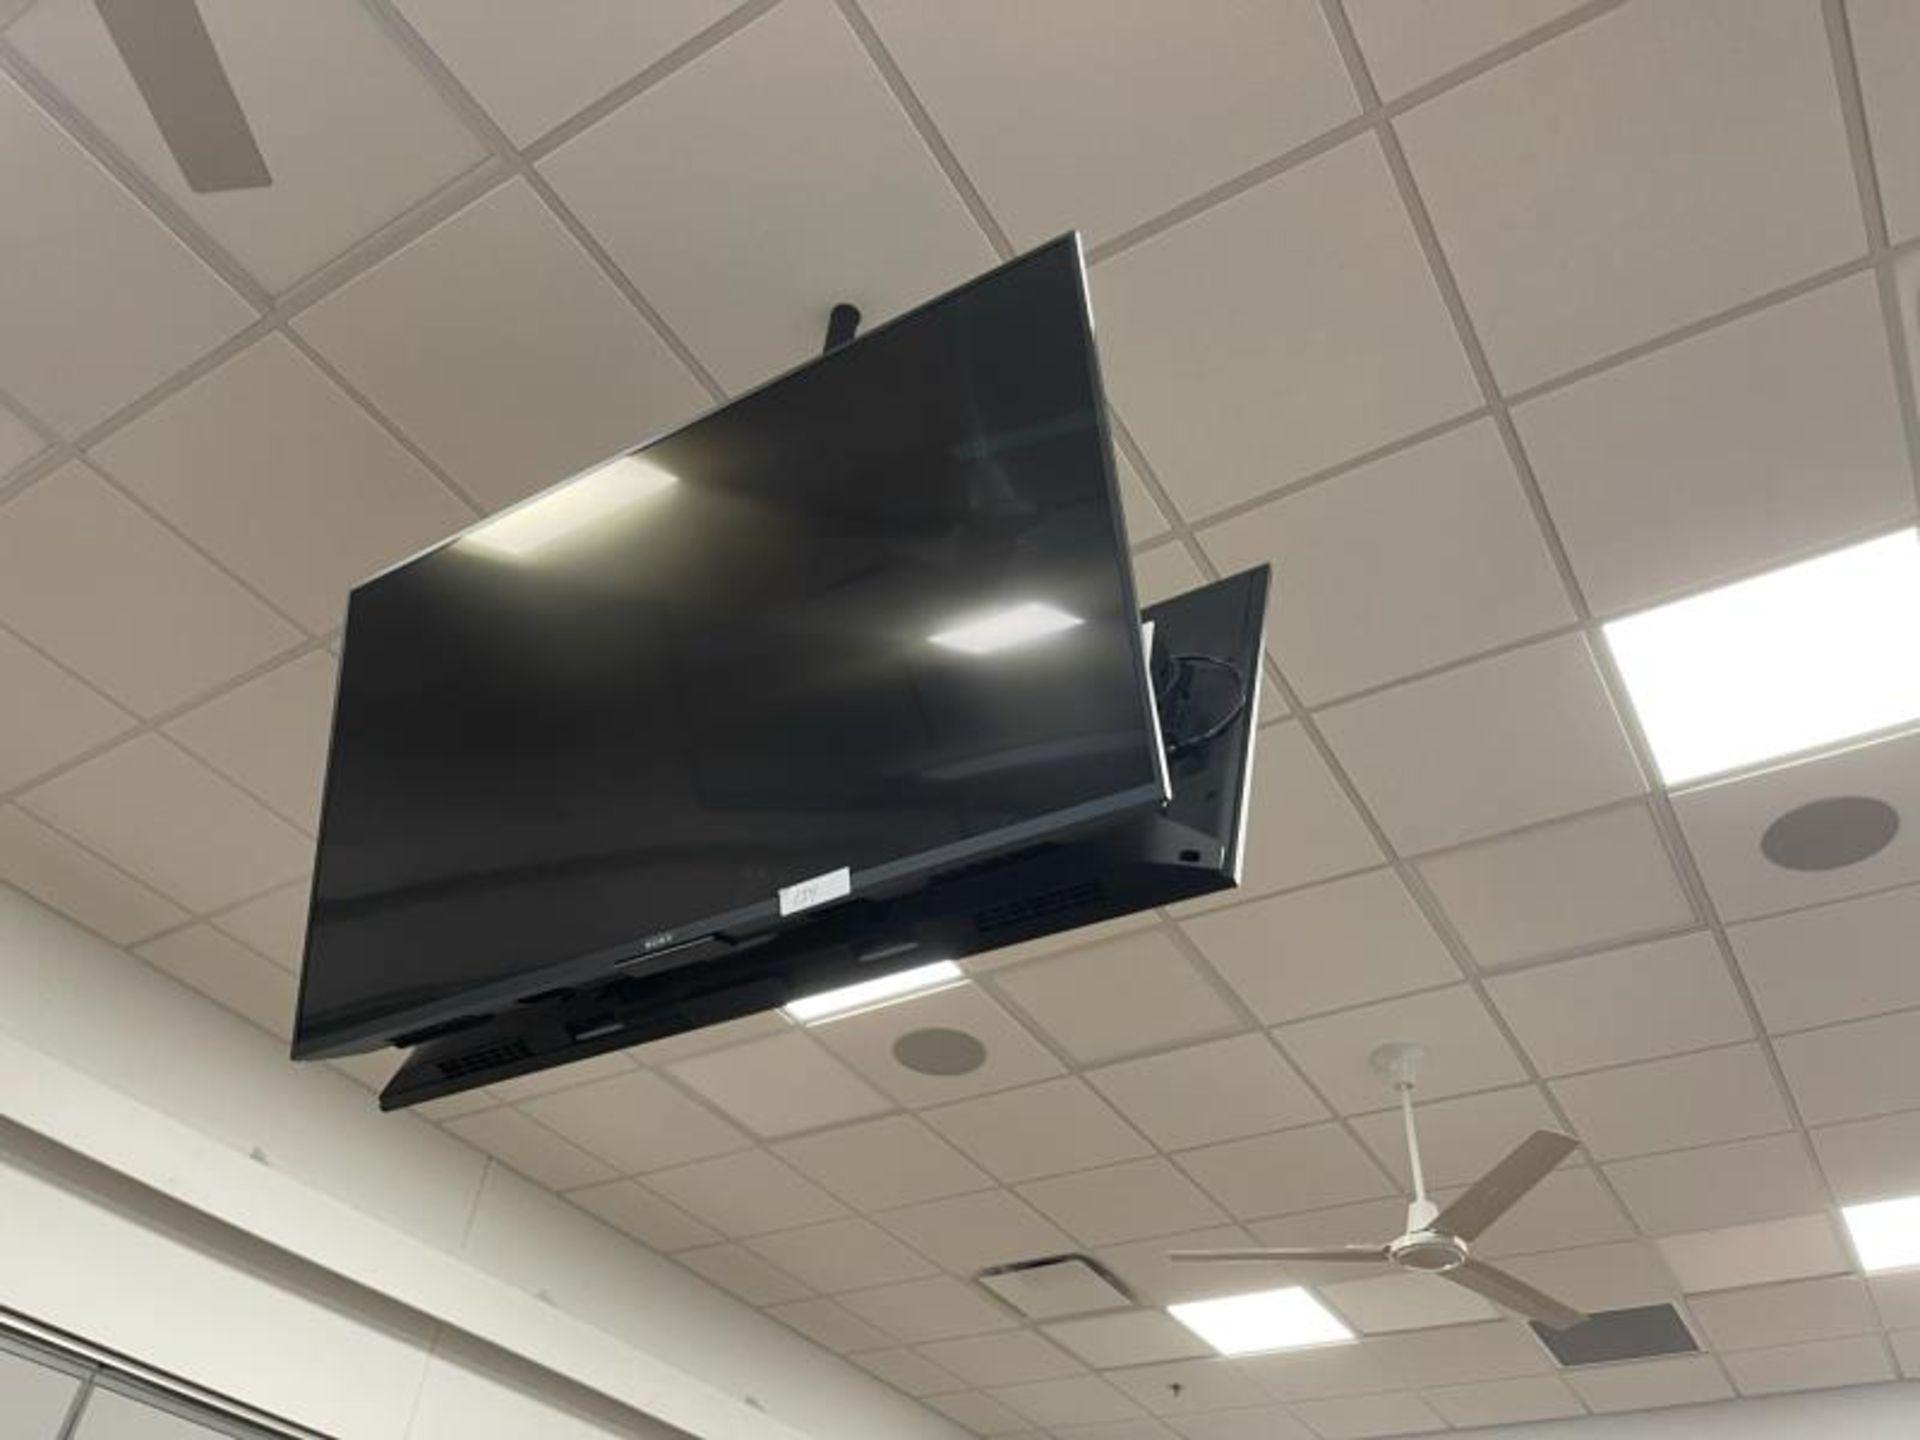 Lot of 2 Sony Flat Panel TV's, No Pole Mount, M: XBR-55X800E